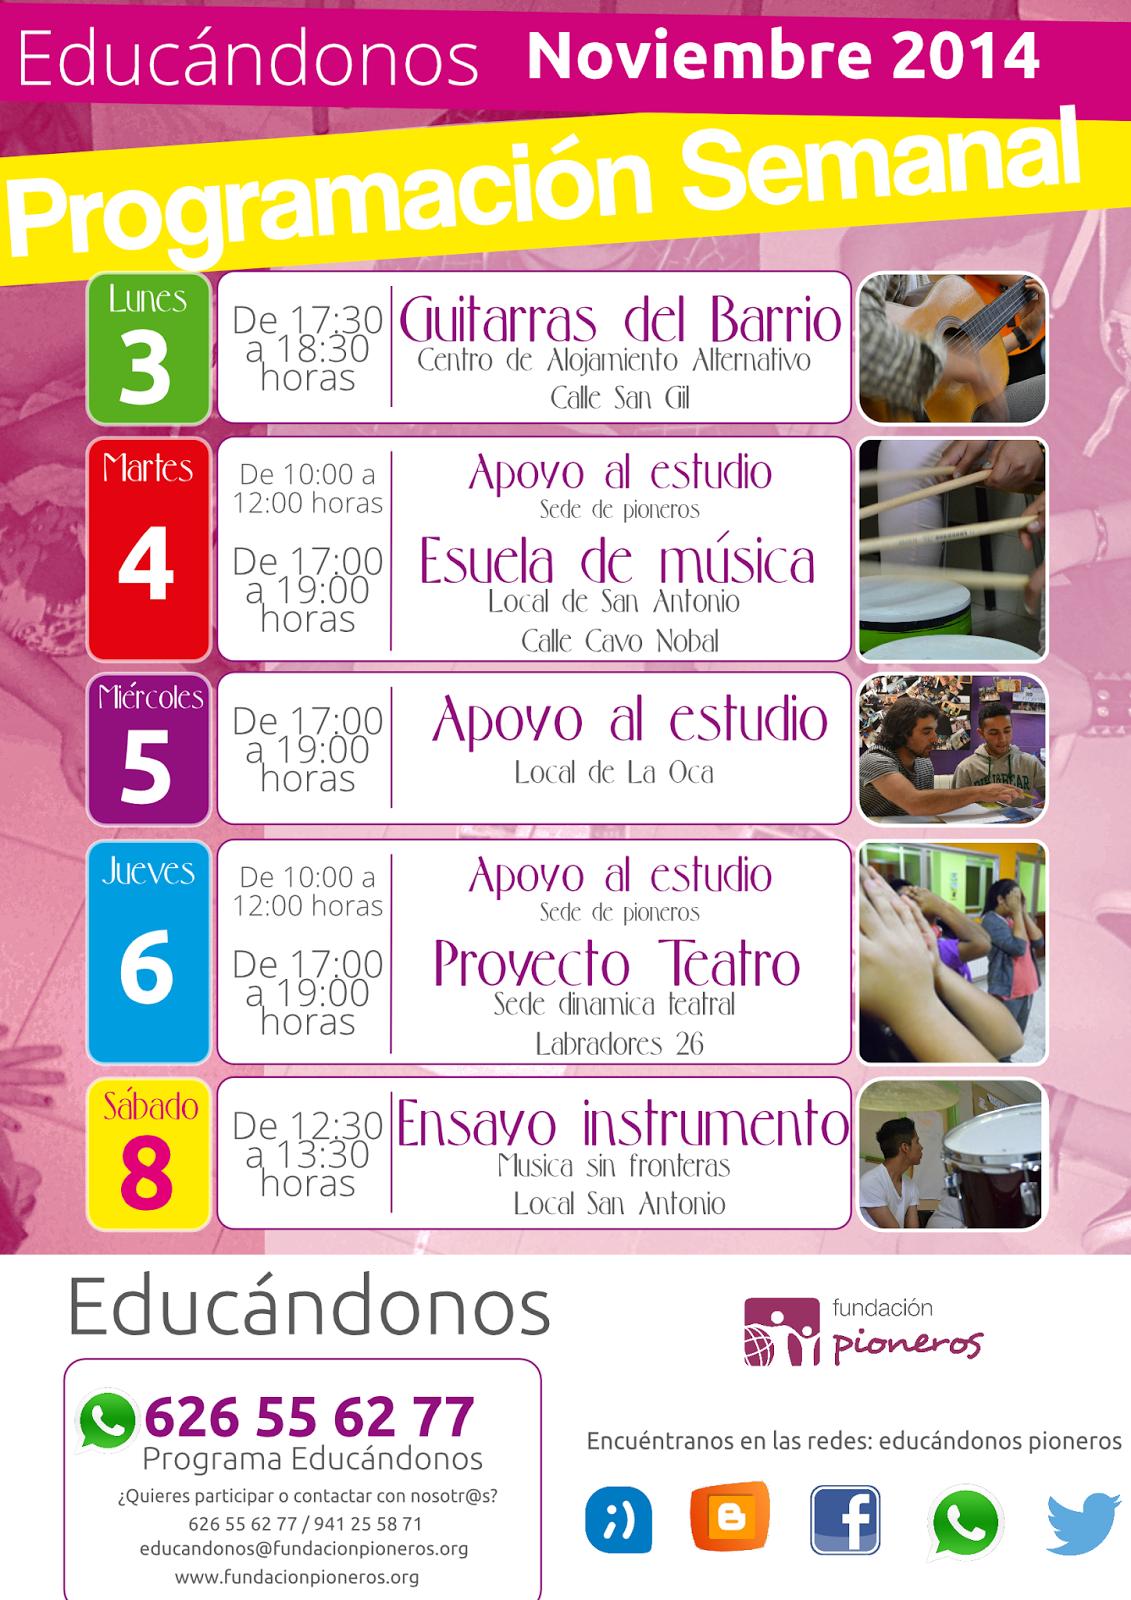 programaciónmensualeducandonosNoviembre2014-página001